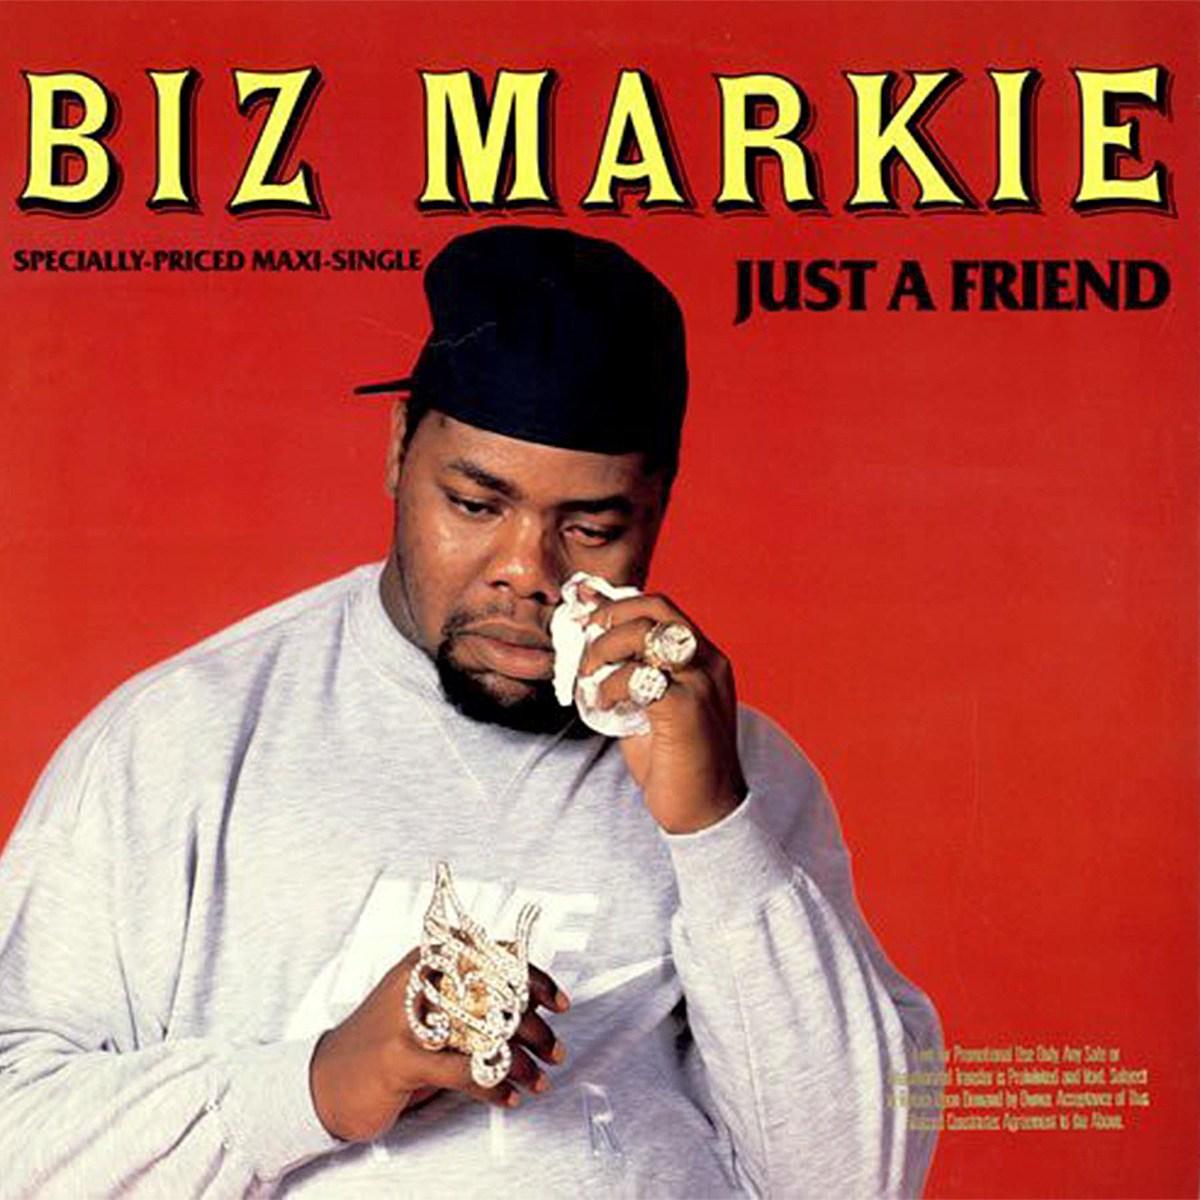 Read tributes to Biz Markie from Q-Tip, El-P, Missy Elliott, Ice T, Bootsy Collins, Flea, more